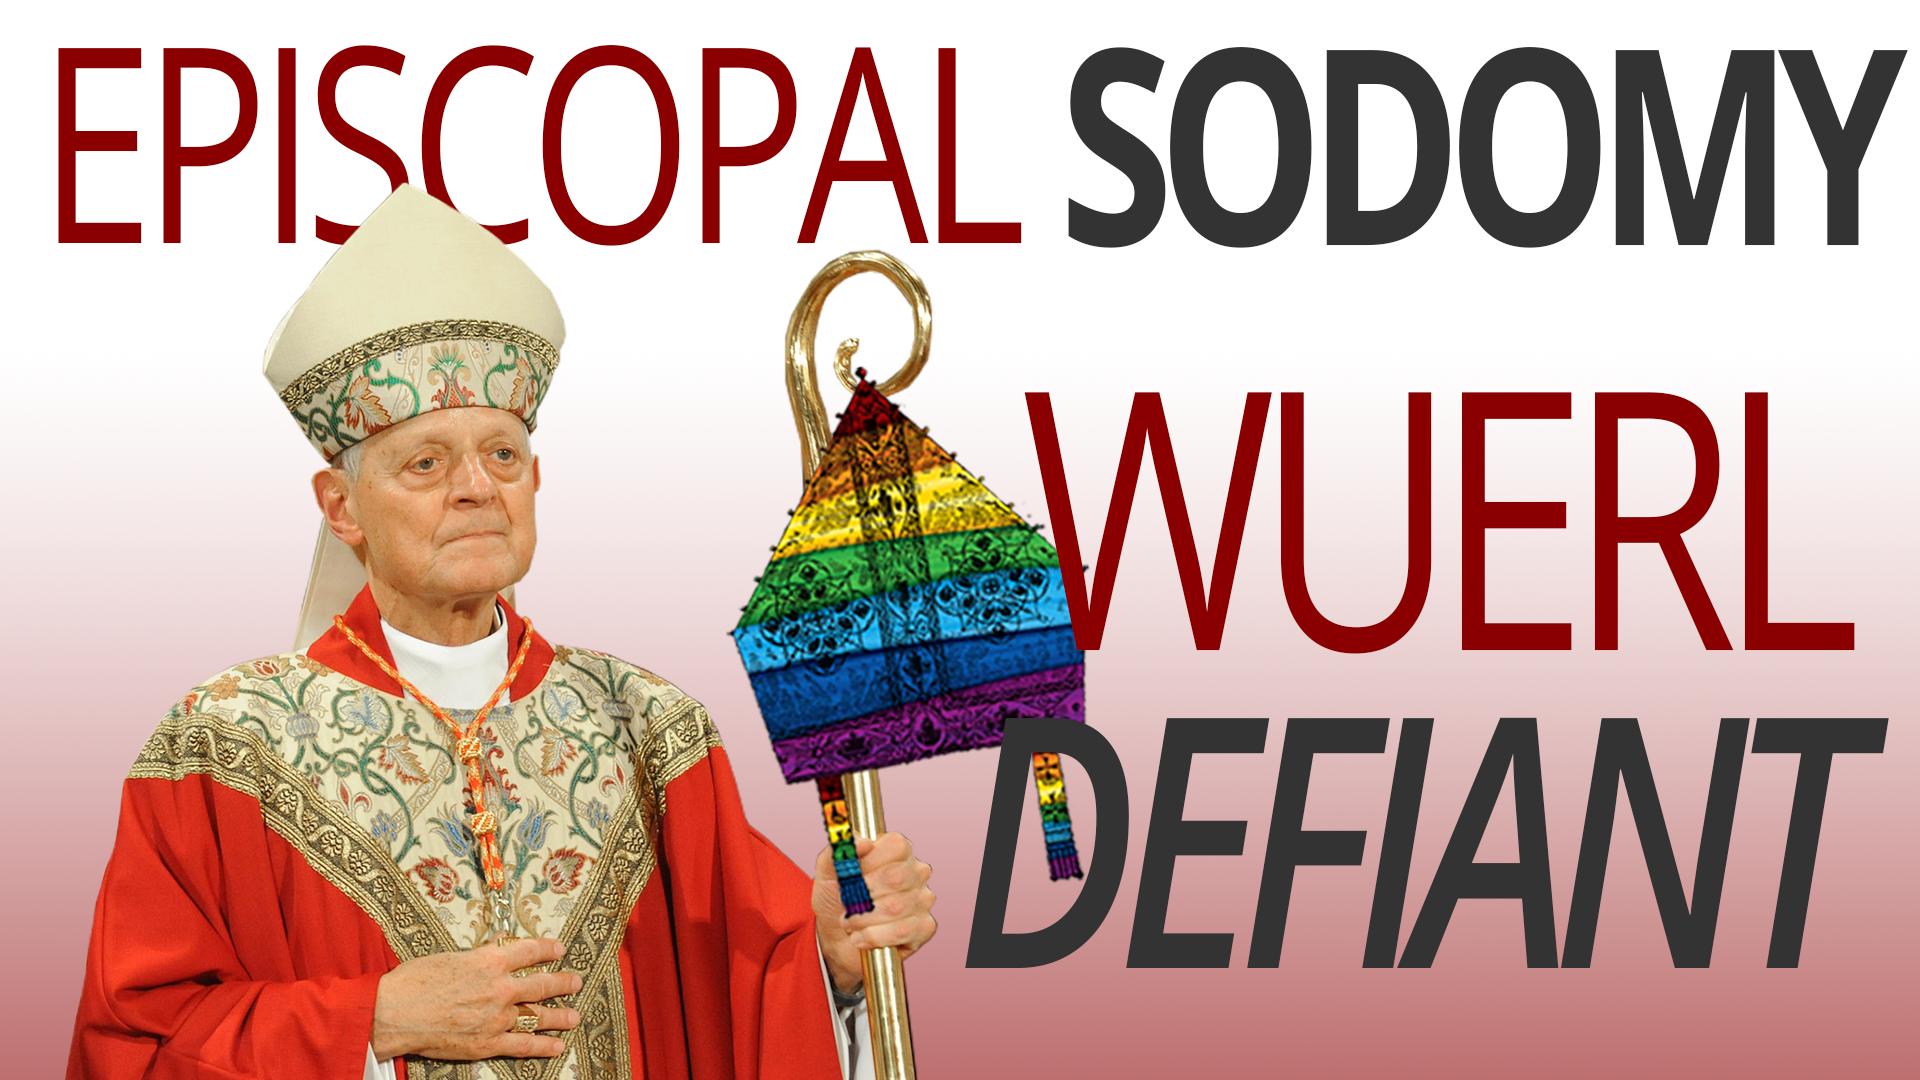 Image result for EPISCOPAL SODOMY - WUERL DEFIANT